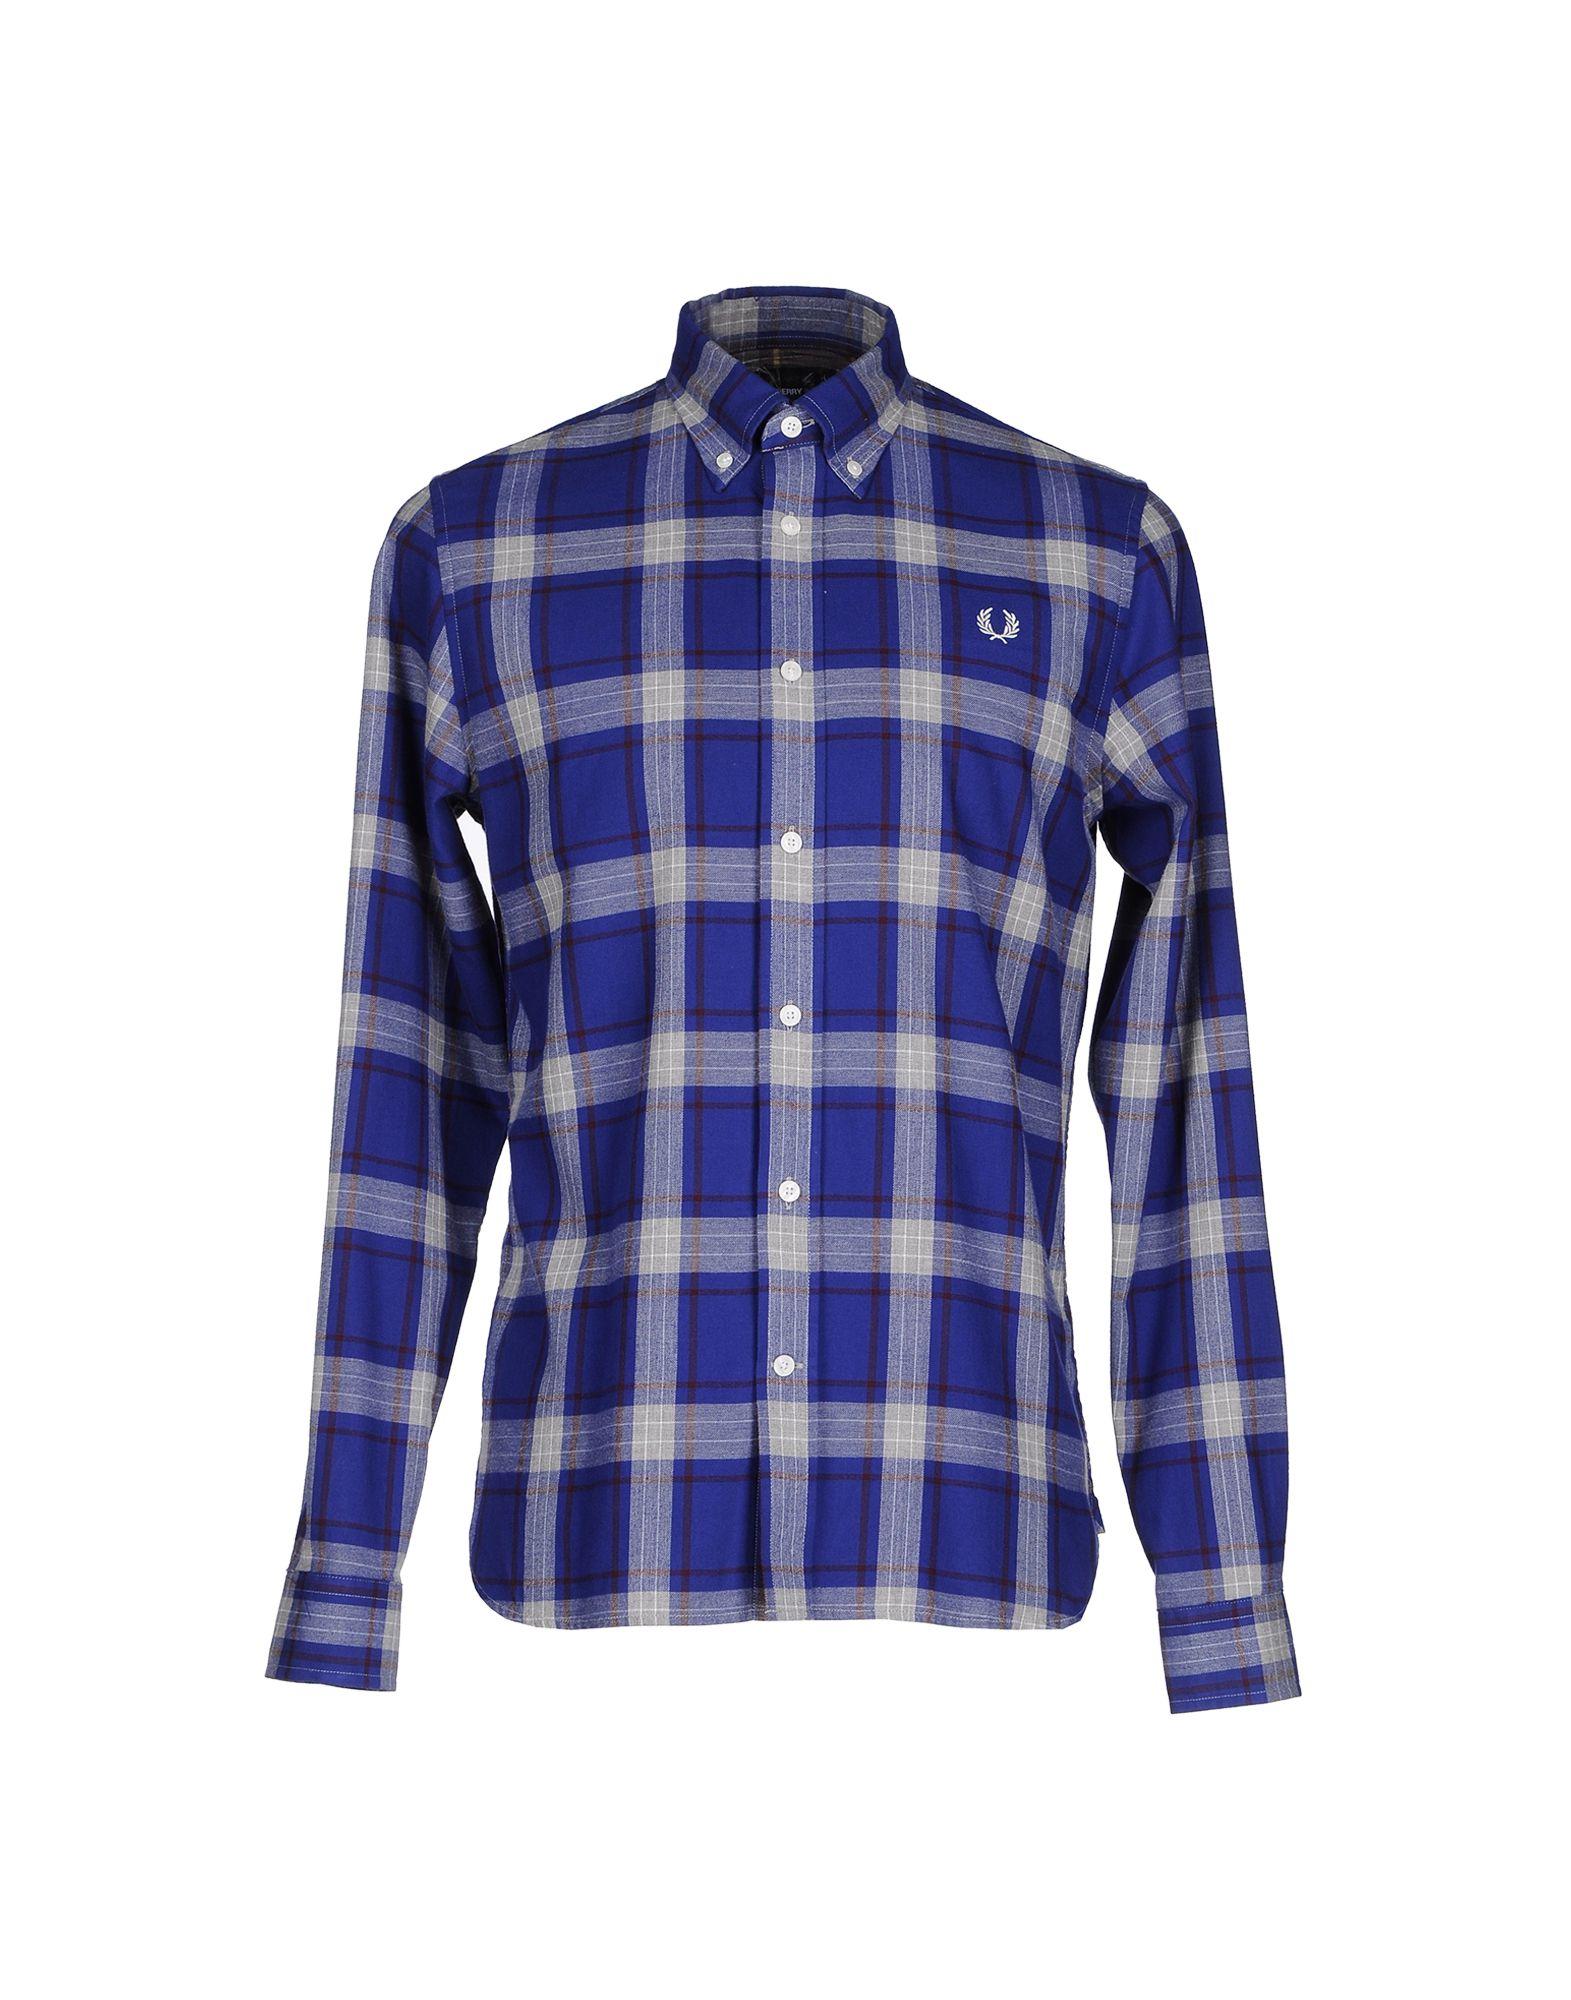 FRED PERRY メンズ シャツ ブルー XS コットン 100%